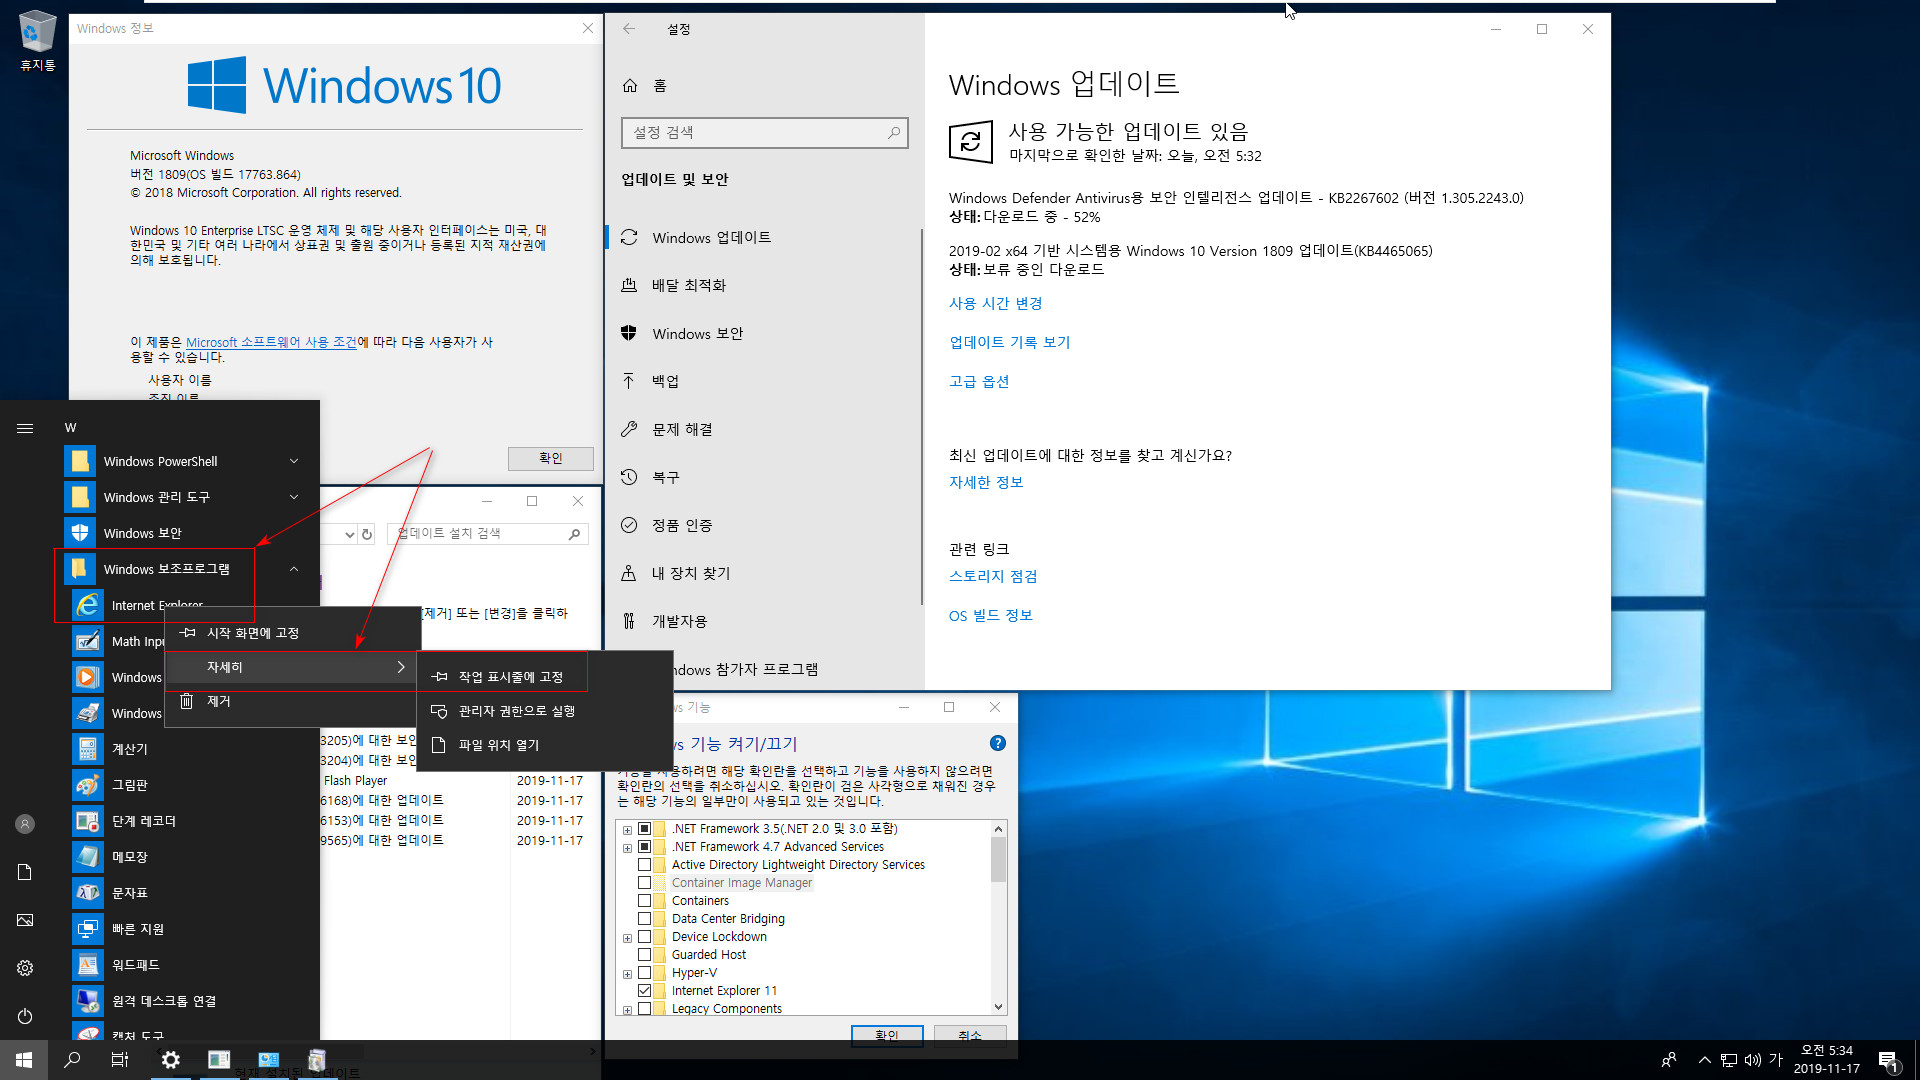 Windows 10 버전 1809 누적 업데이트 KB4523205 (OS 빌드 17763.864) [2019-11-12 일자] 중에 LTSC 2019 통합중 입니다 - 순정 상태입니다 - IE 작업표시줄 고정 2019-11-17_053411.jpg